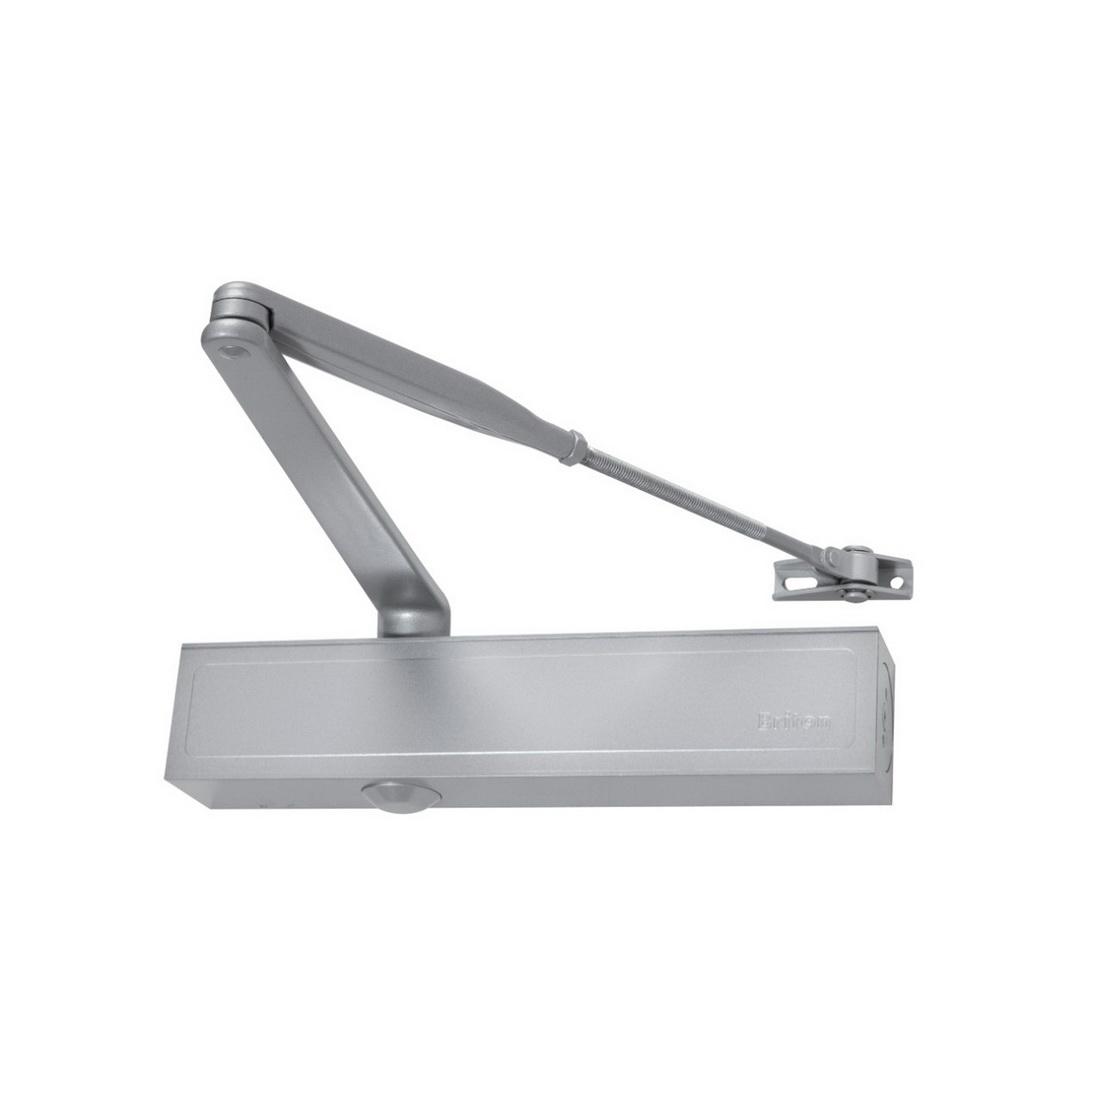 1120 Series Door Closer Die-Cast Aluminium Sprayed Silver